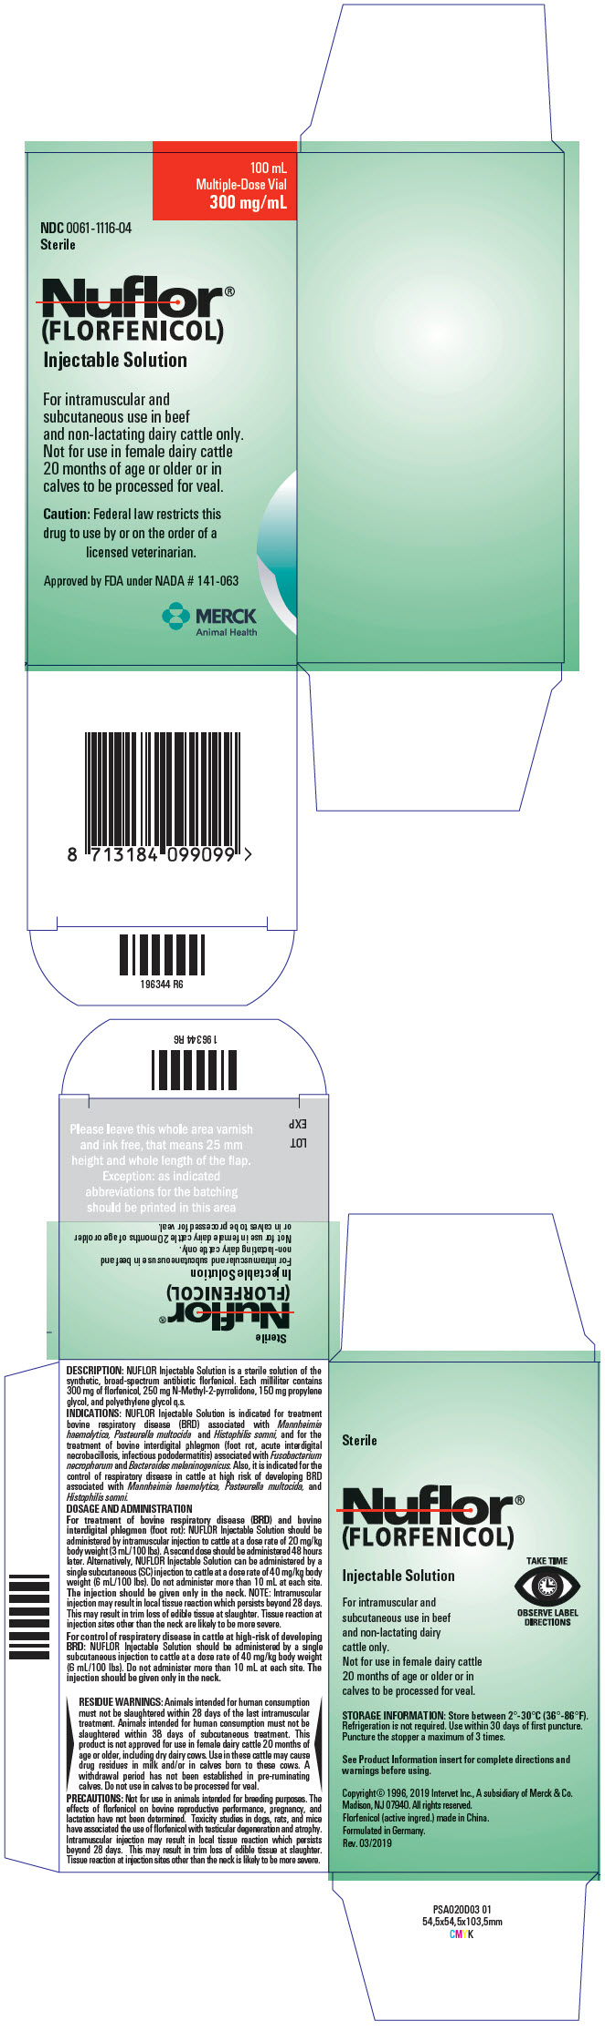 Nuflor (Florfenicol) Injection, Solution [Merck Sharp & Dohme Corp.]